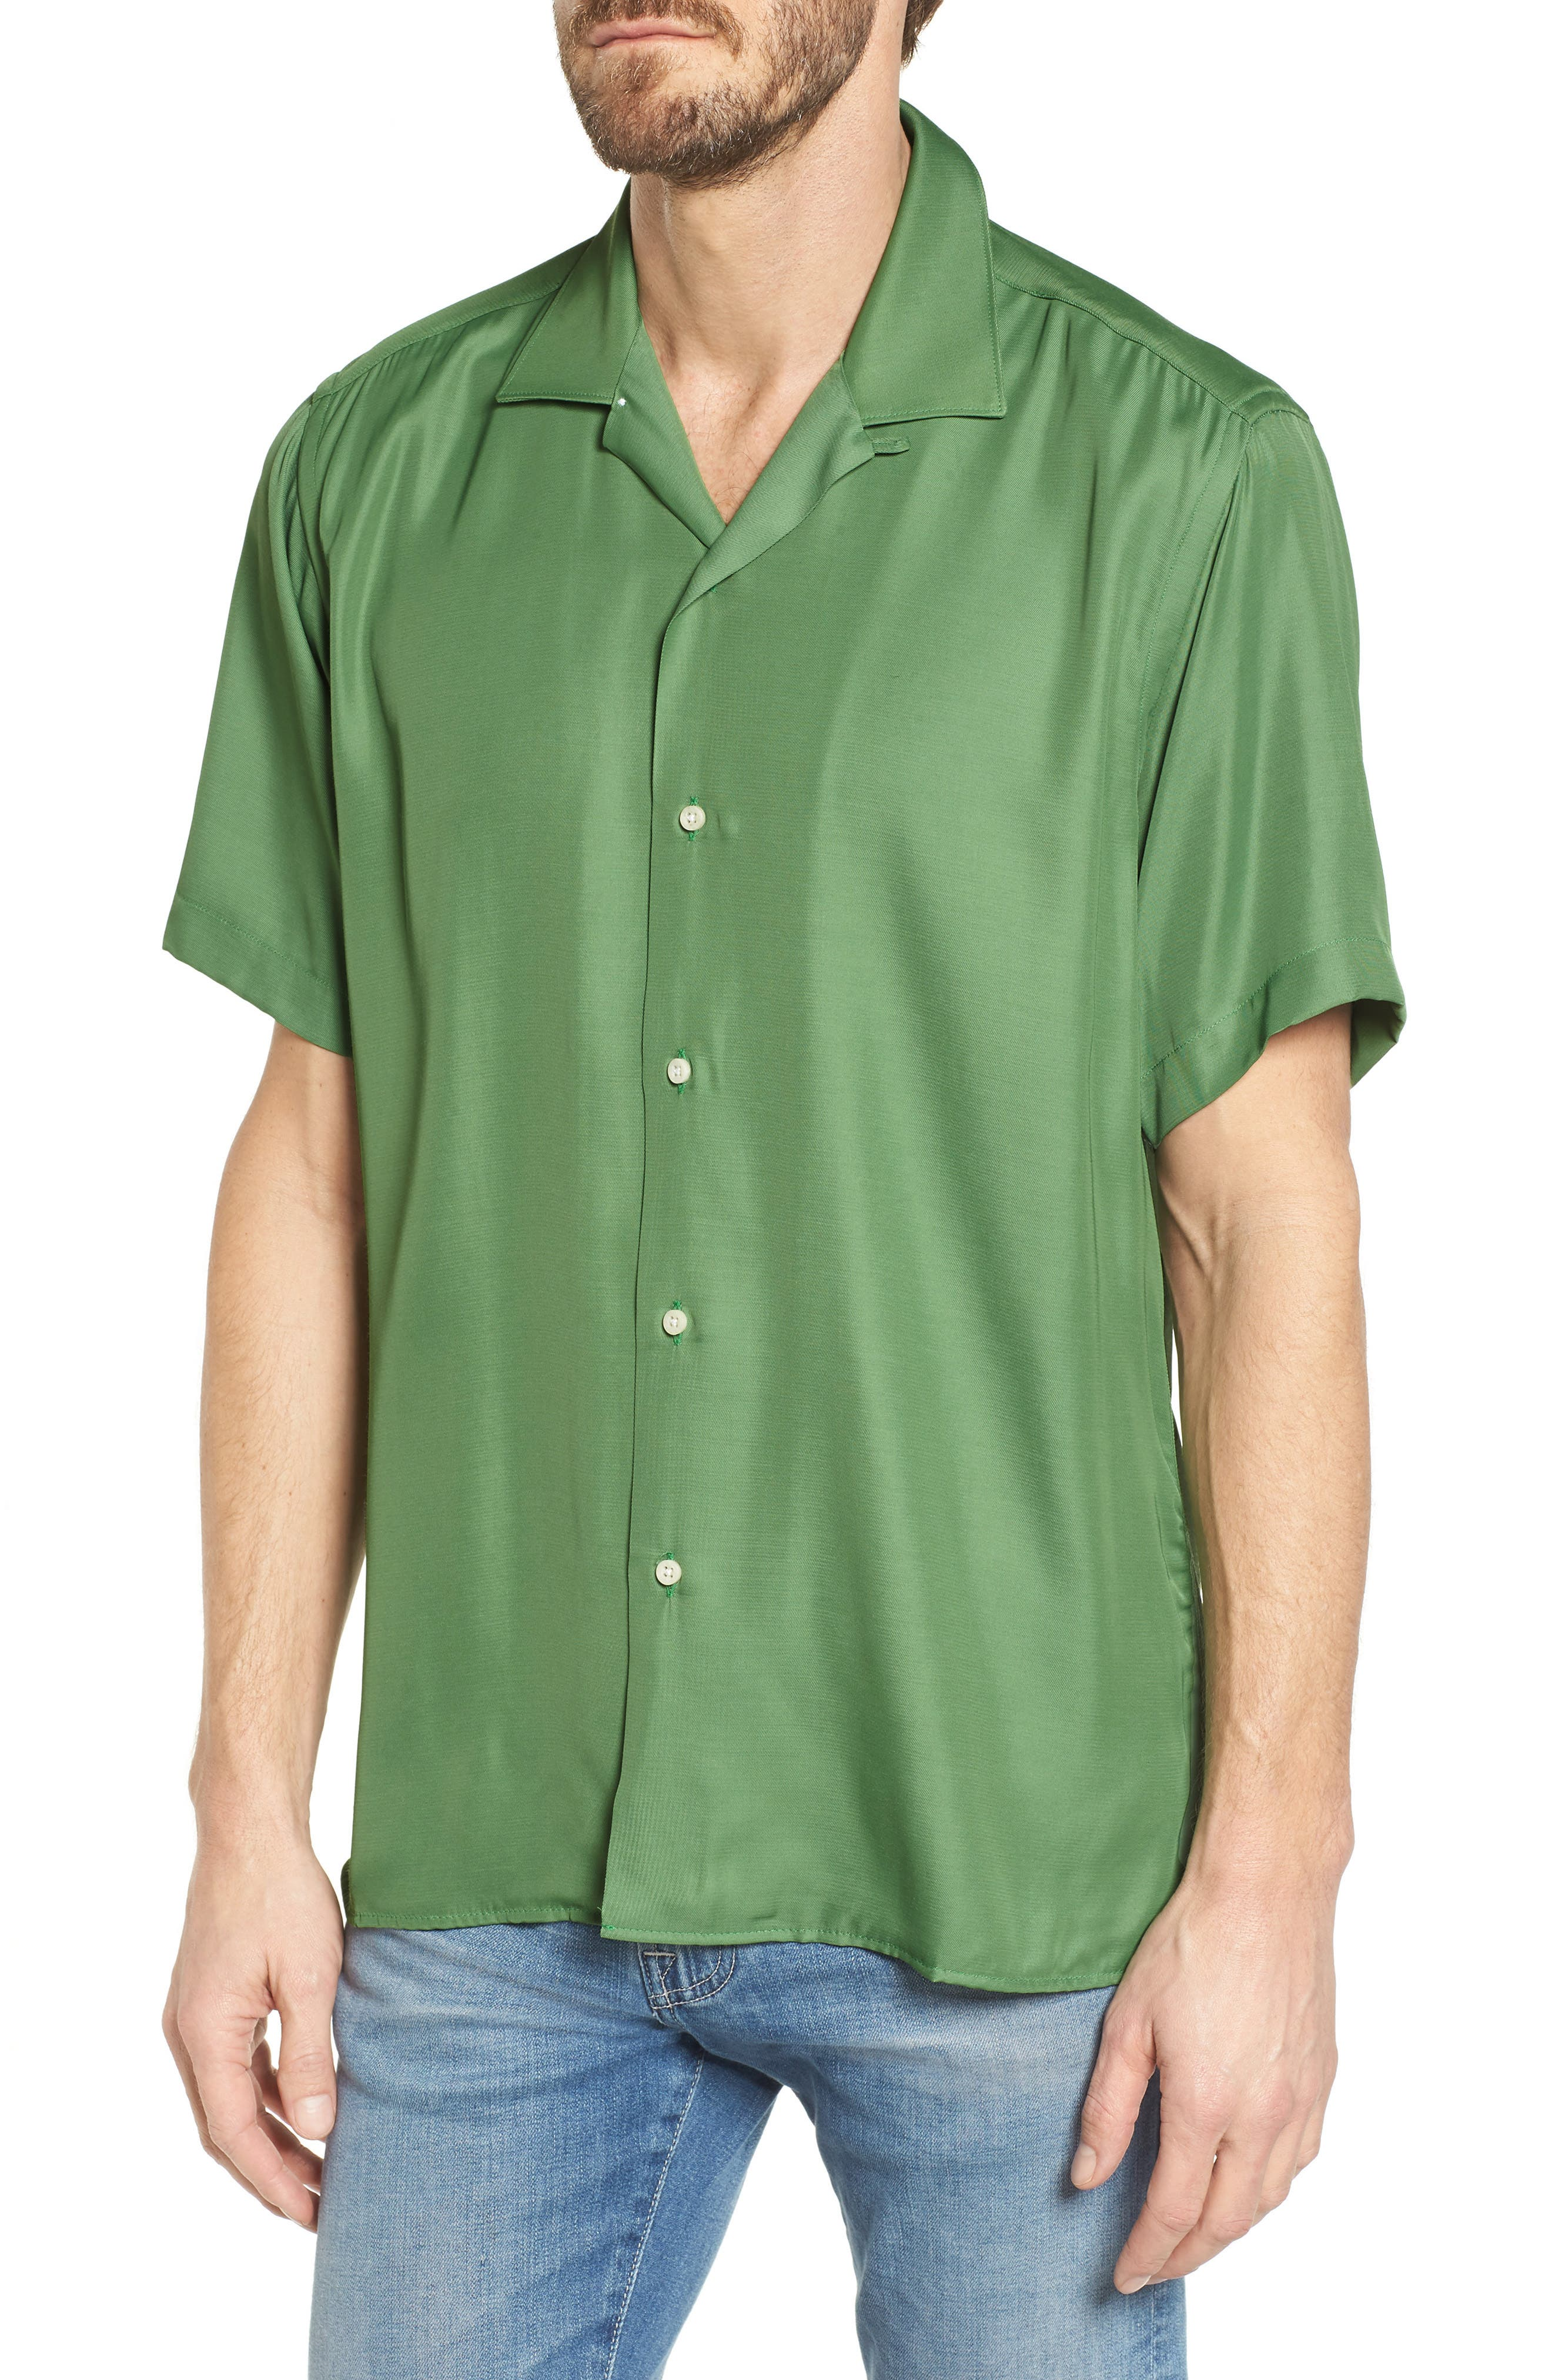 Alternate Image 1 Selected - Gitman Camp Shirt